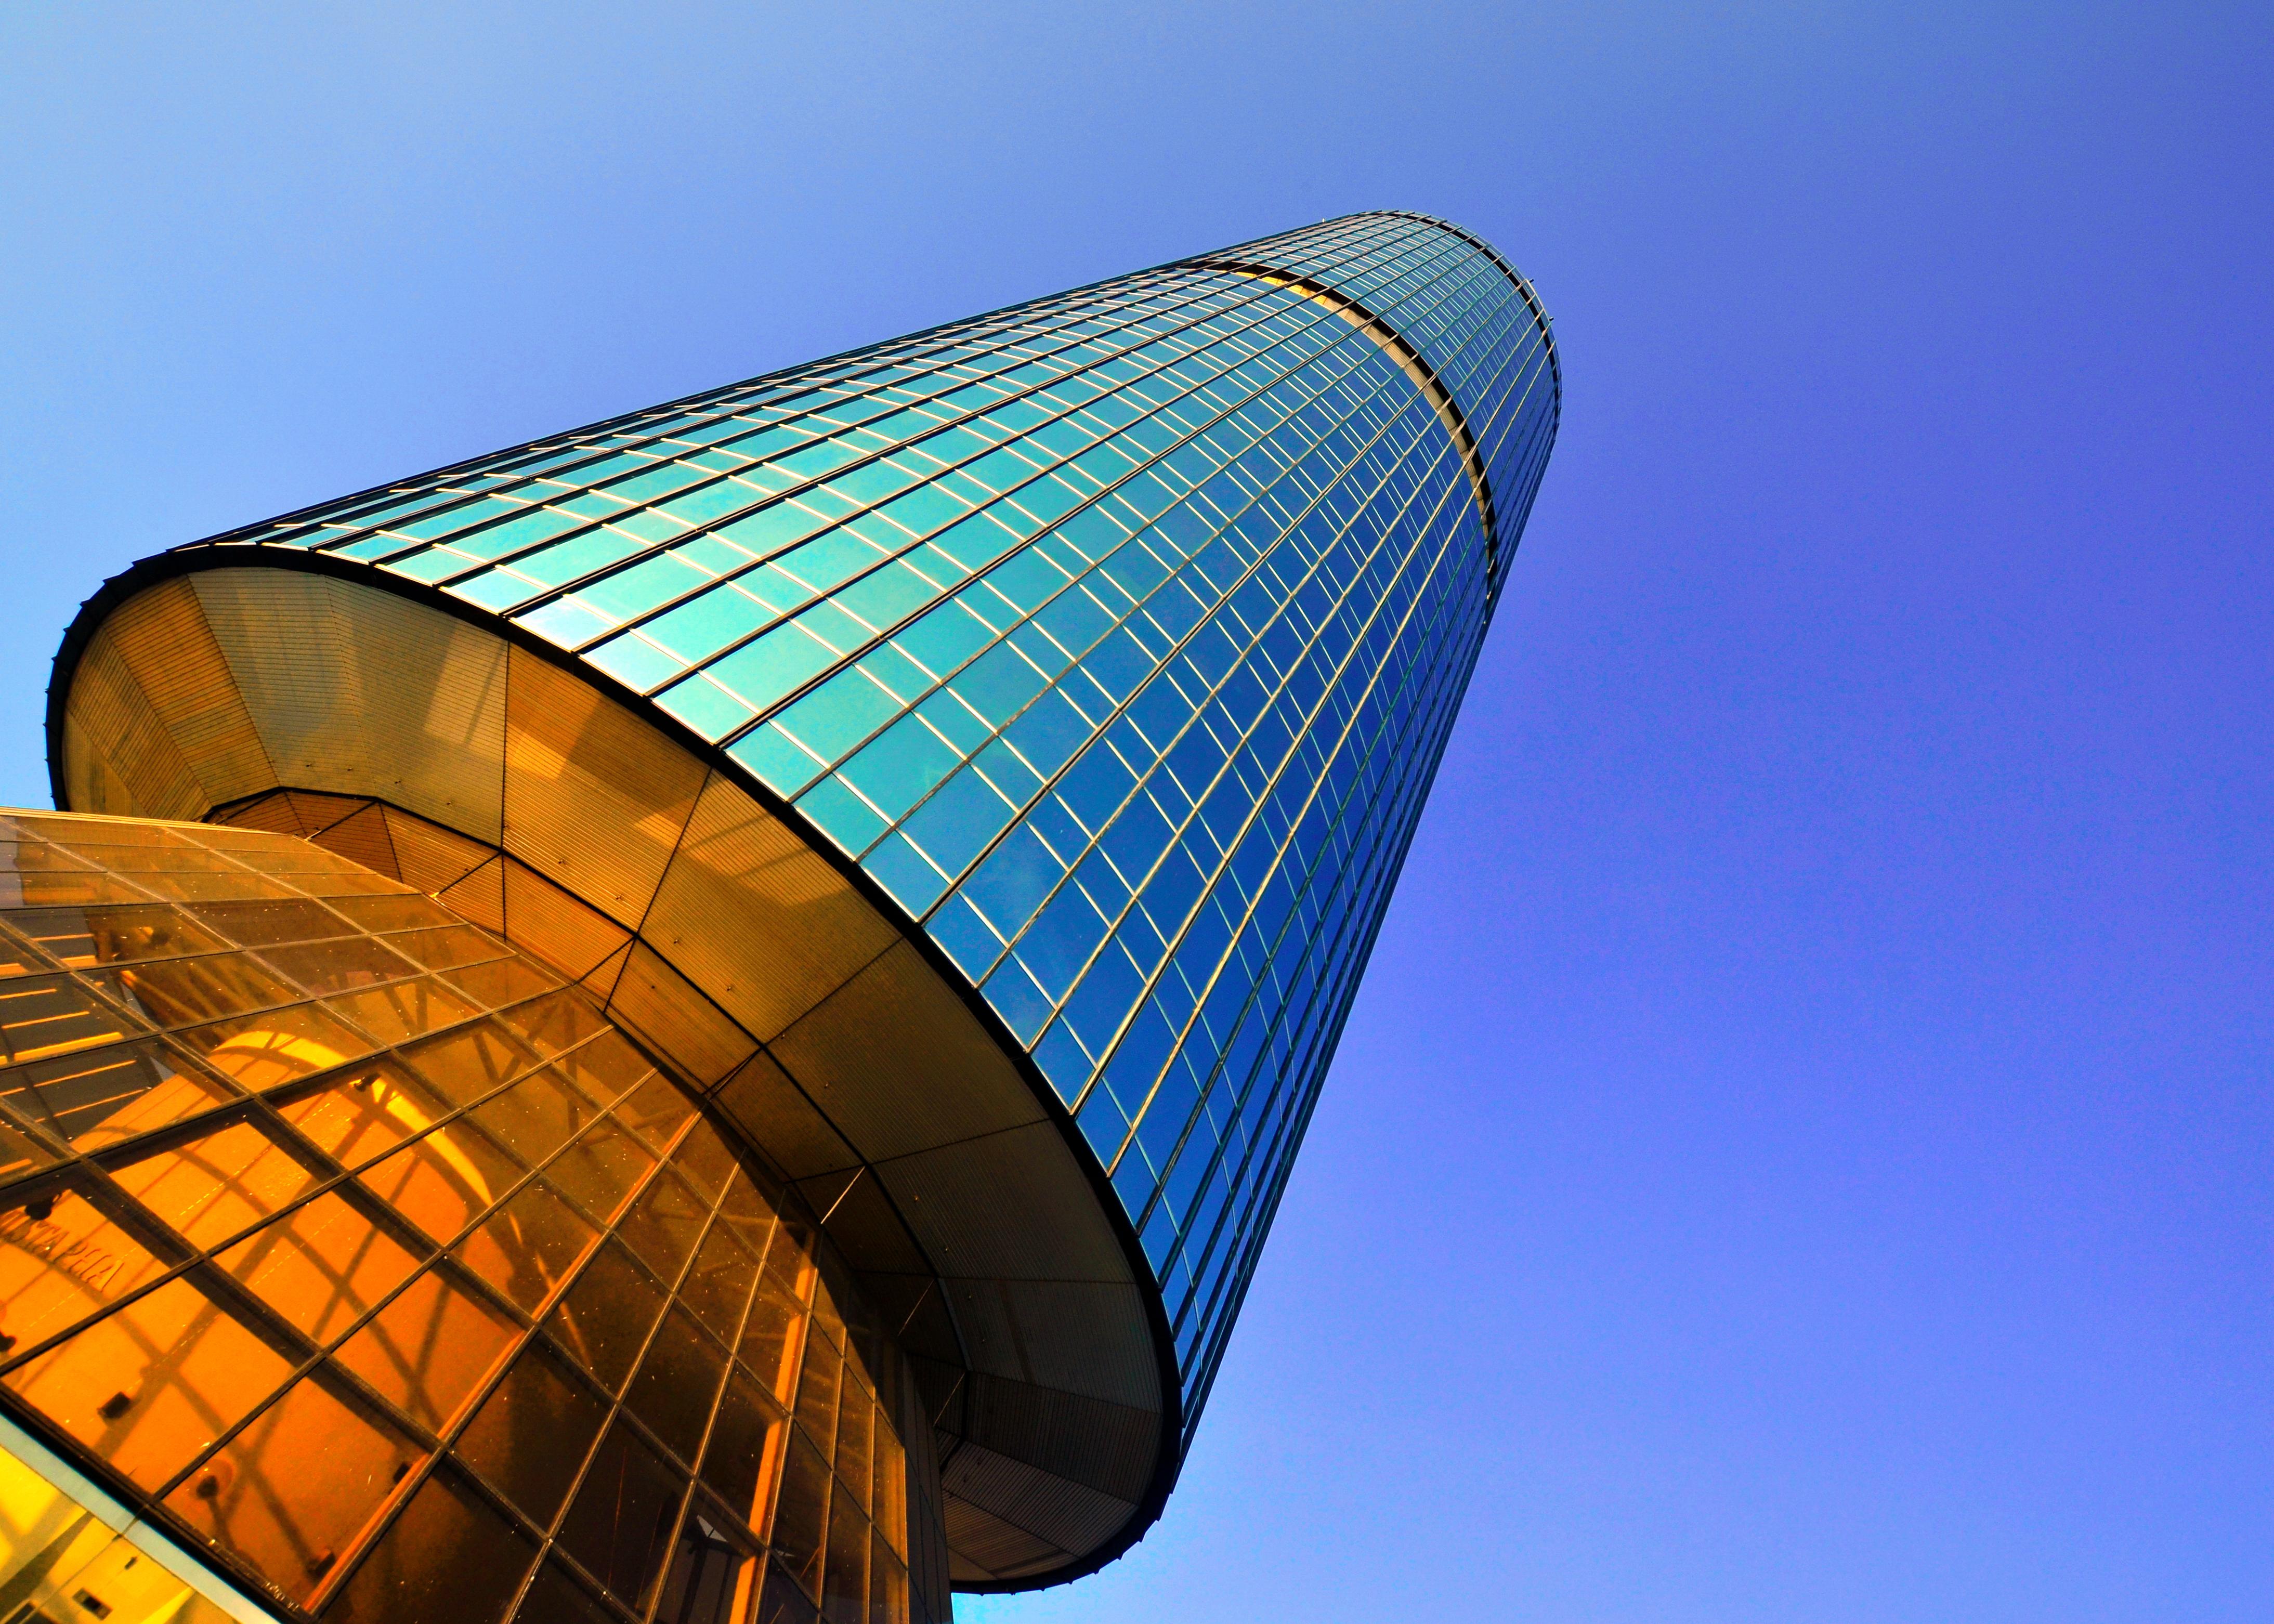 File Yayasan Sabah Tower Image Taken From Worm S Eye View Jpg Wikimedia Commons